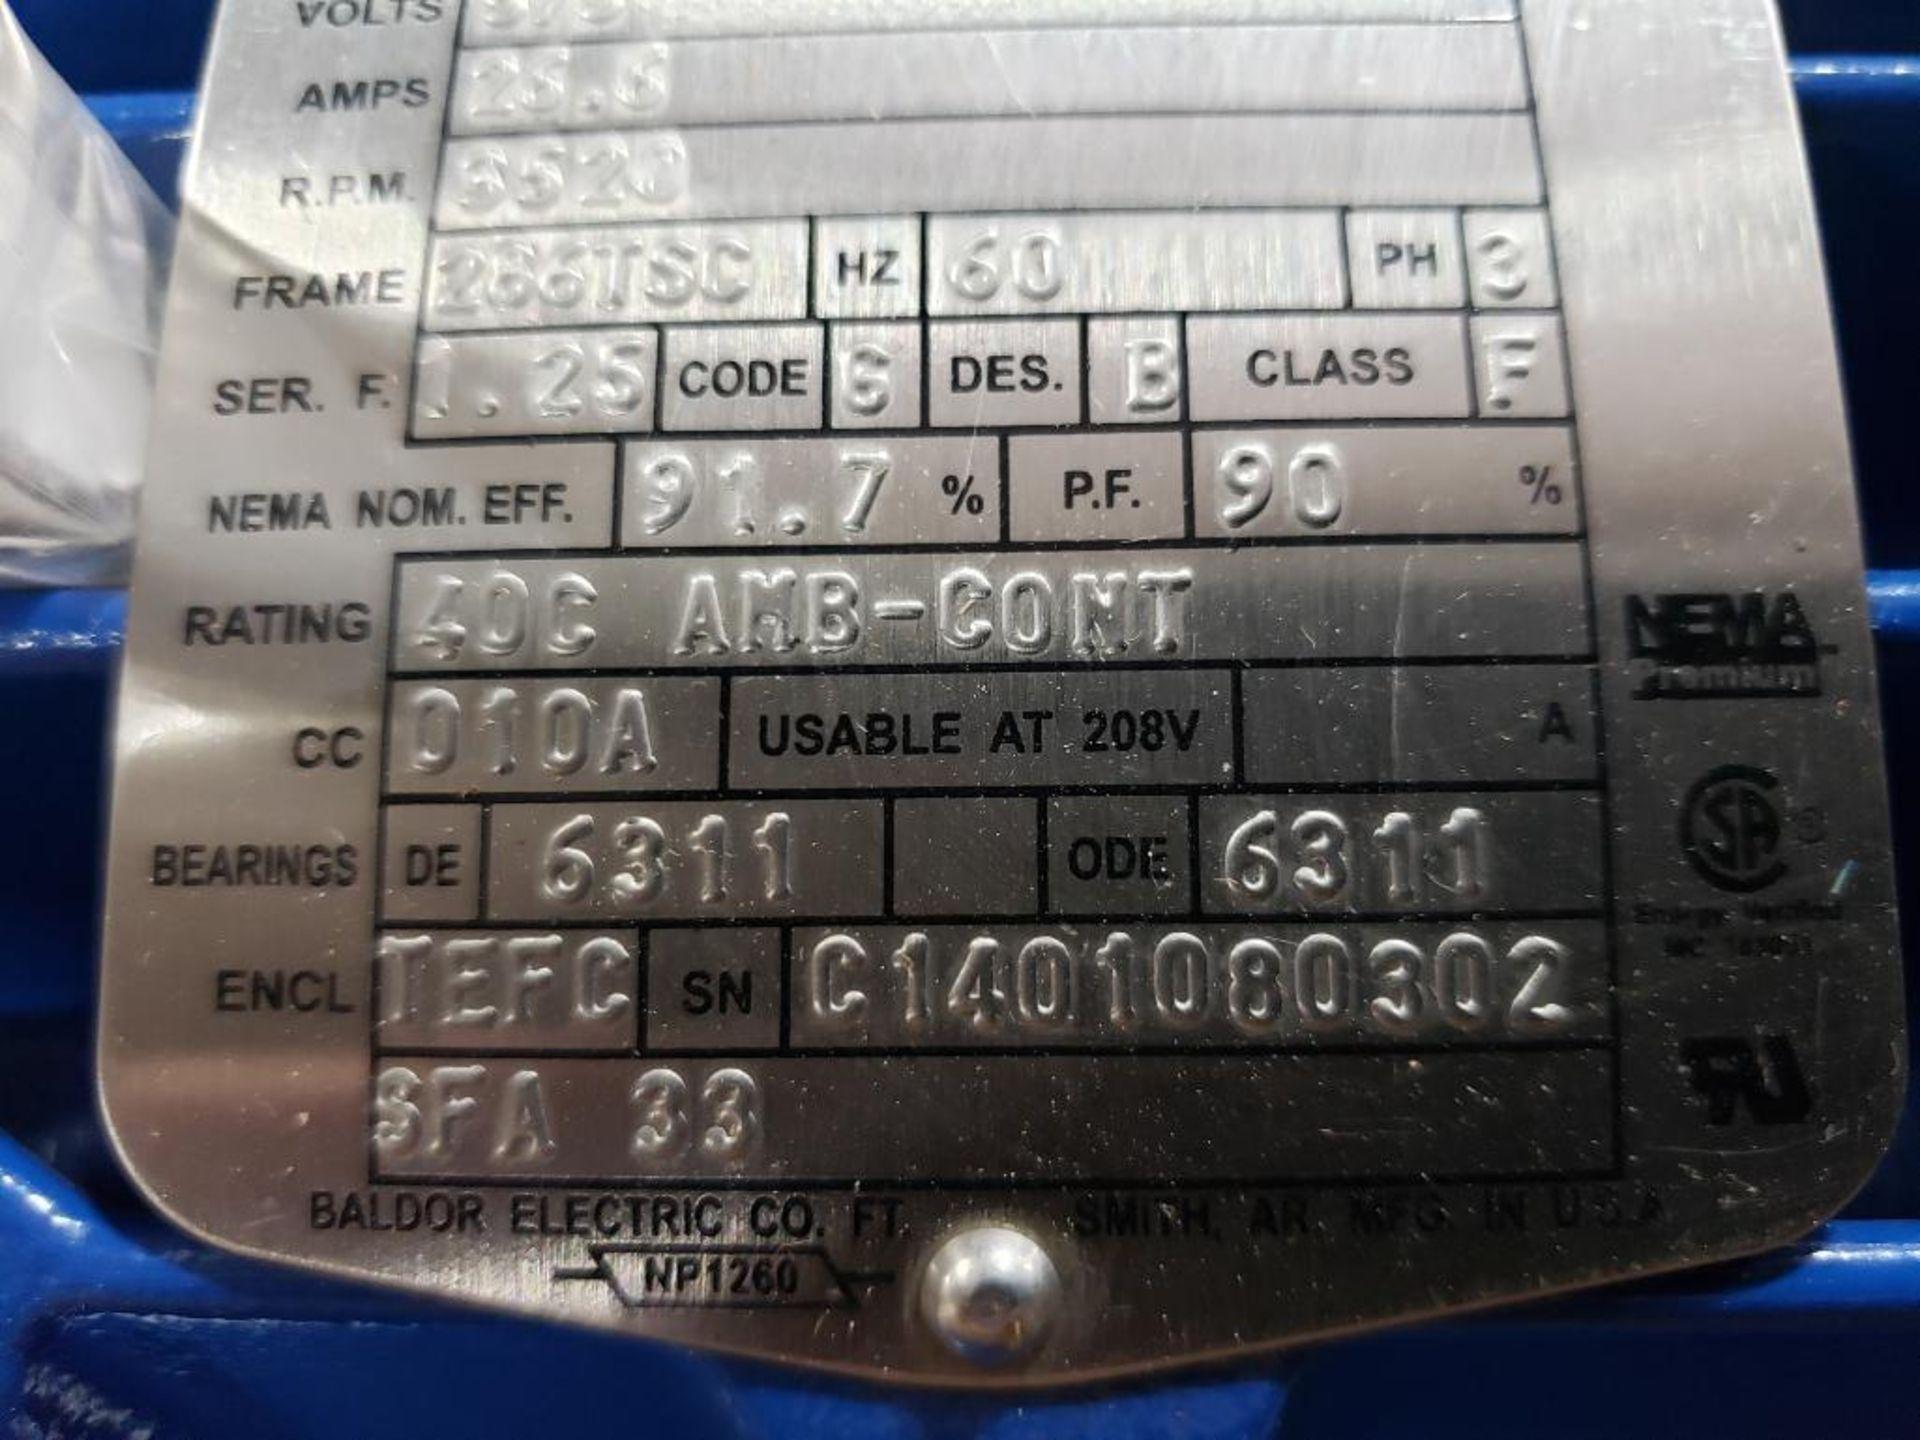 30HP Baldor Reliance 3PH motor. 2013000110. 575V, 3520RPM, 286TSC-Frame. - Image 5 of 6